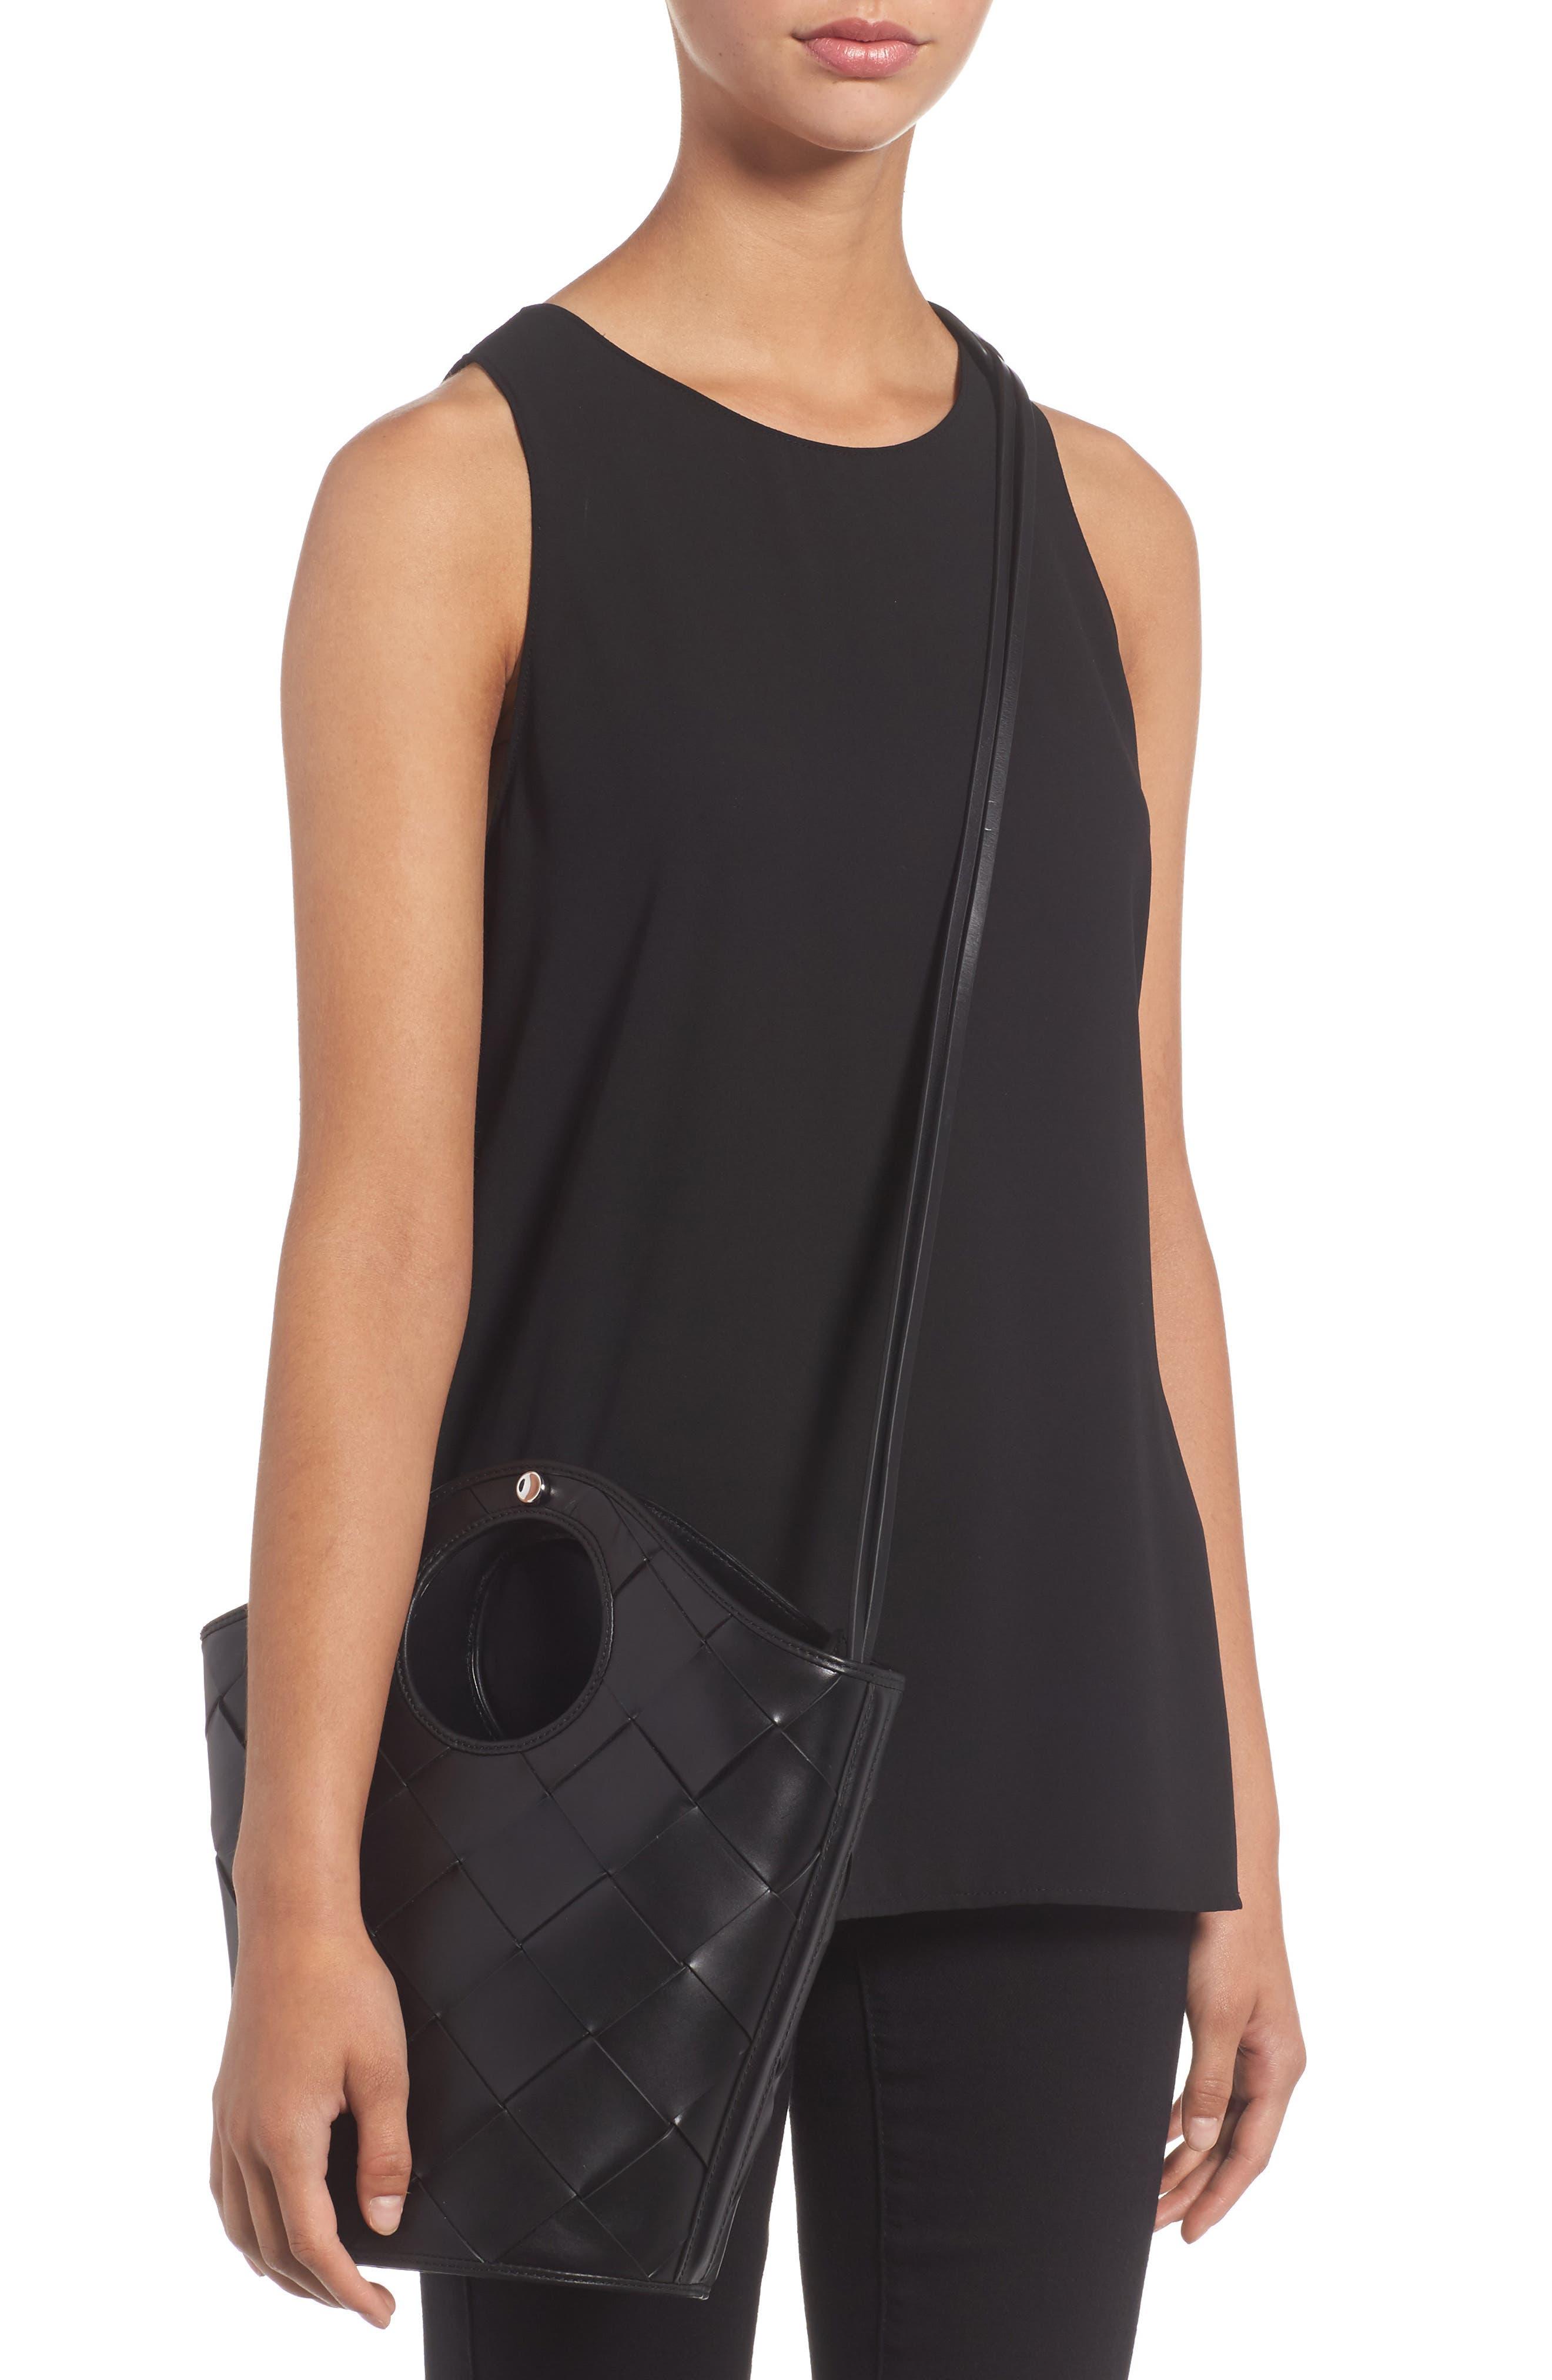 Small Market Woven Leather Crossbody Shopper,                             Alternate thumbnail 2, color,                             Black